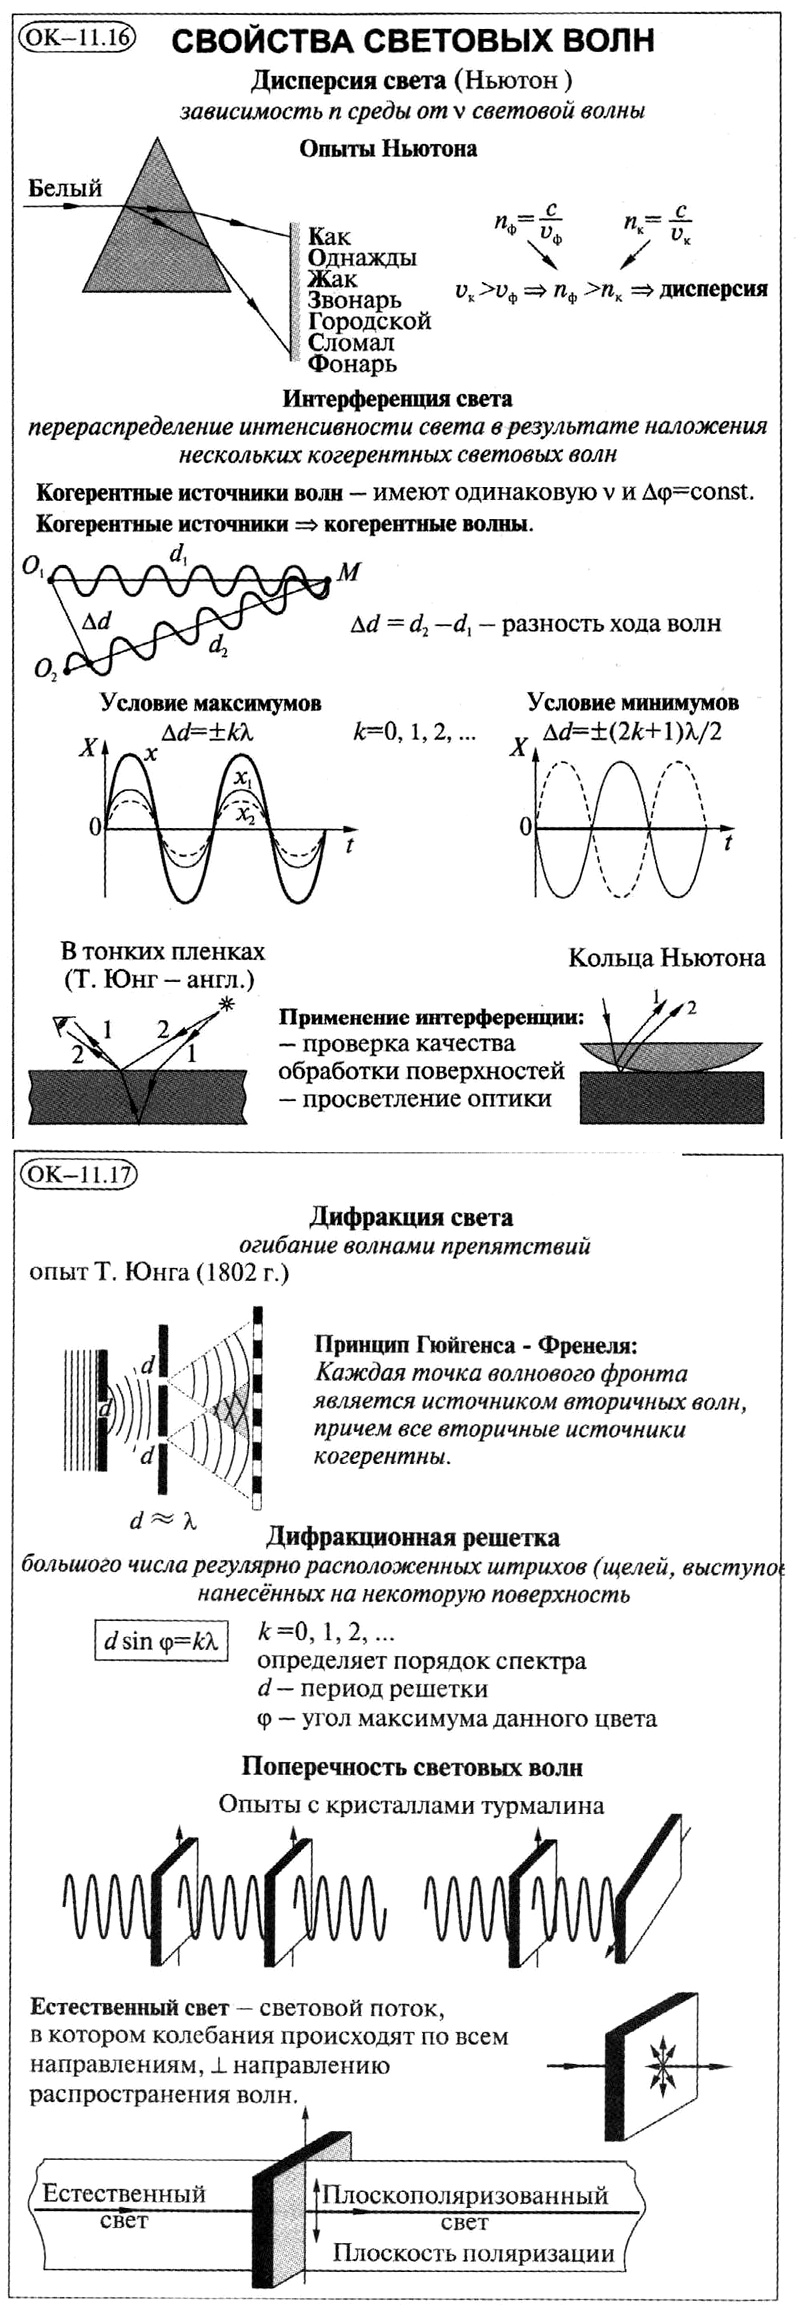 Стоячая волна - standing wave